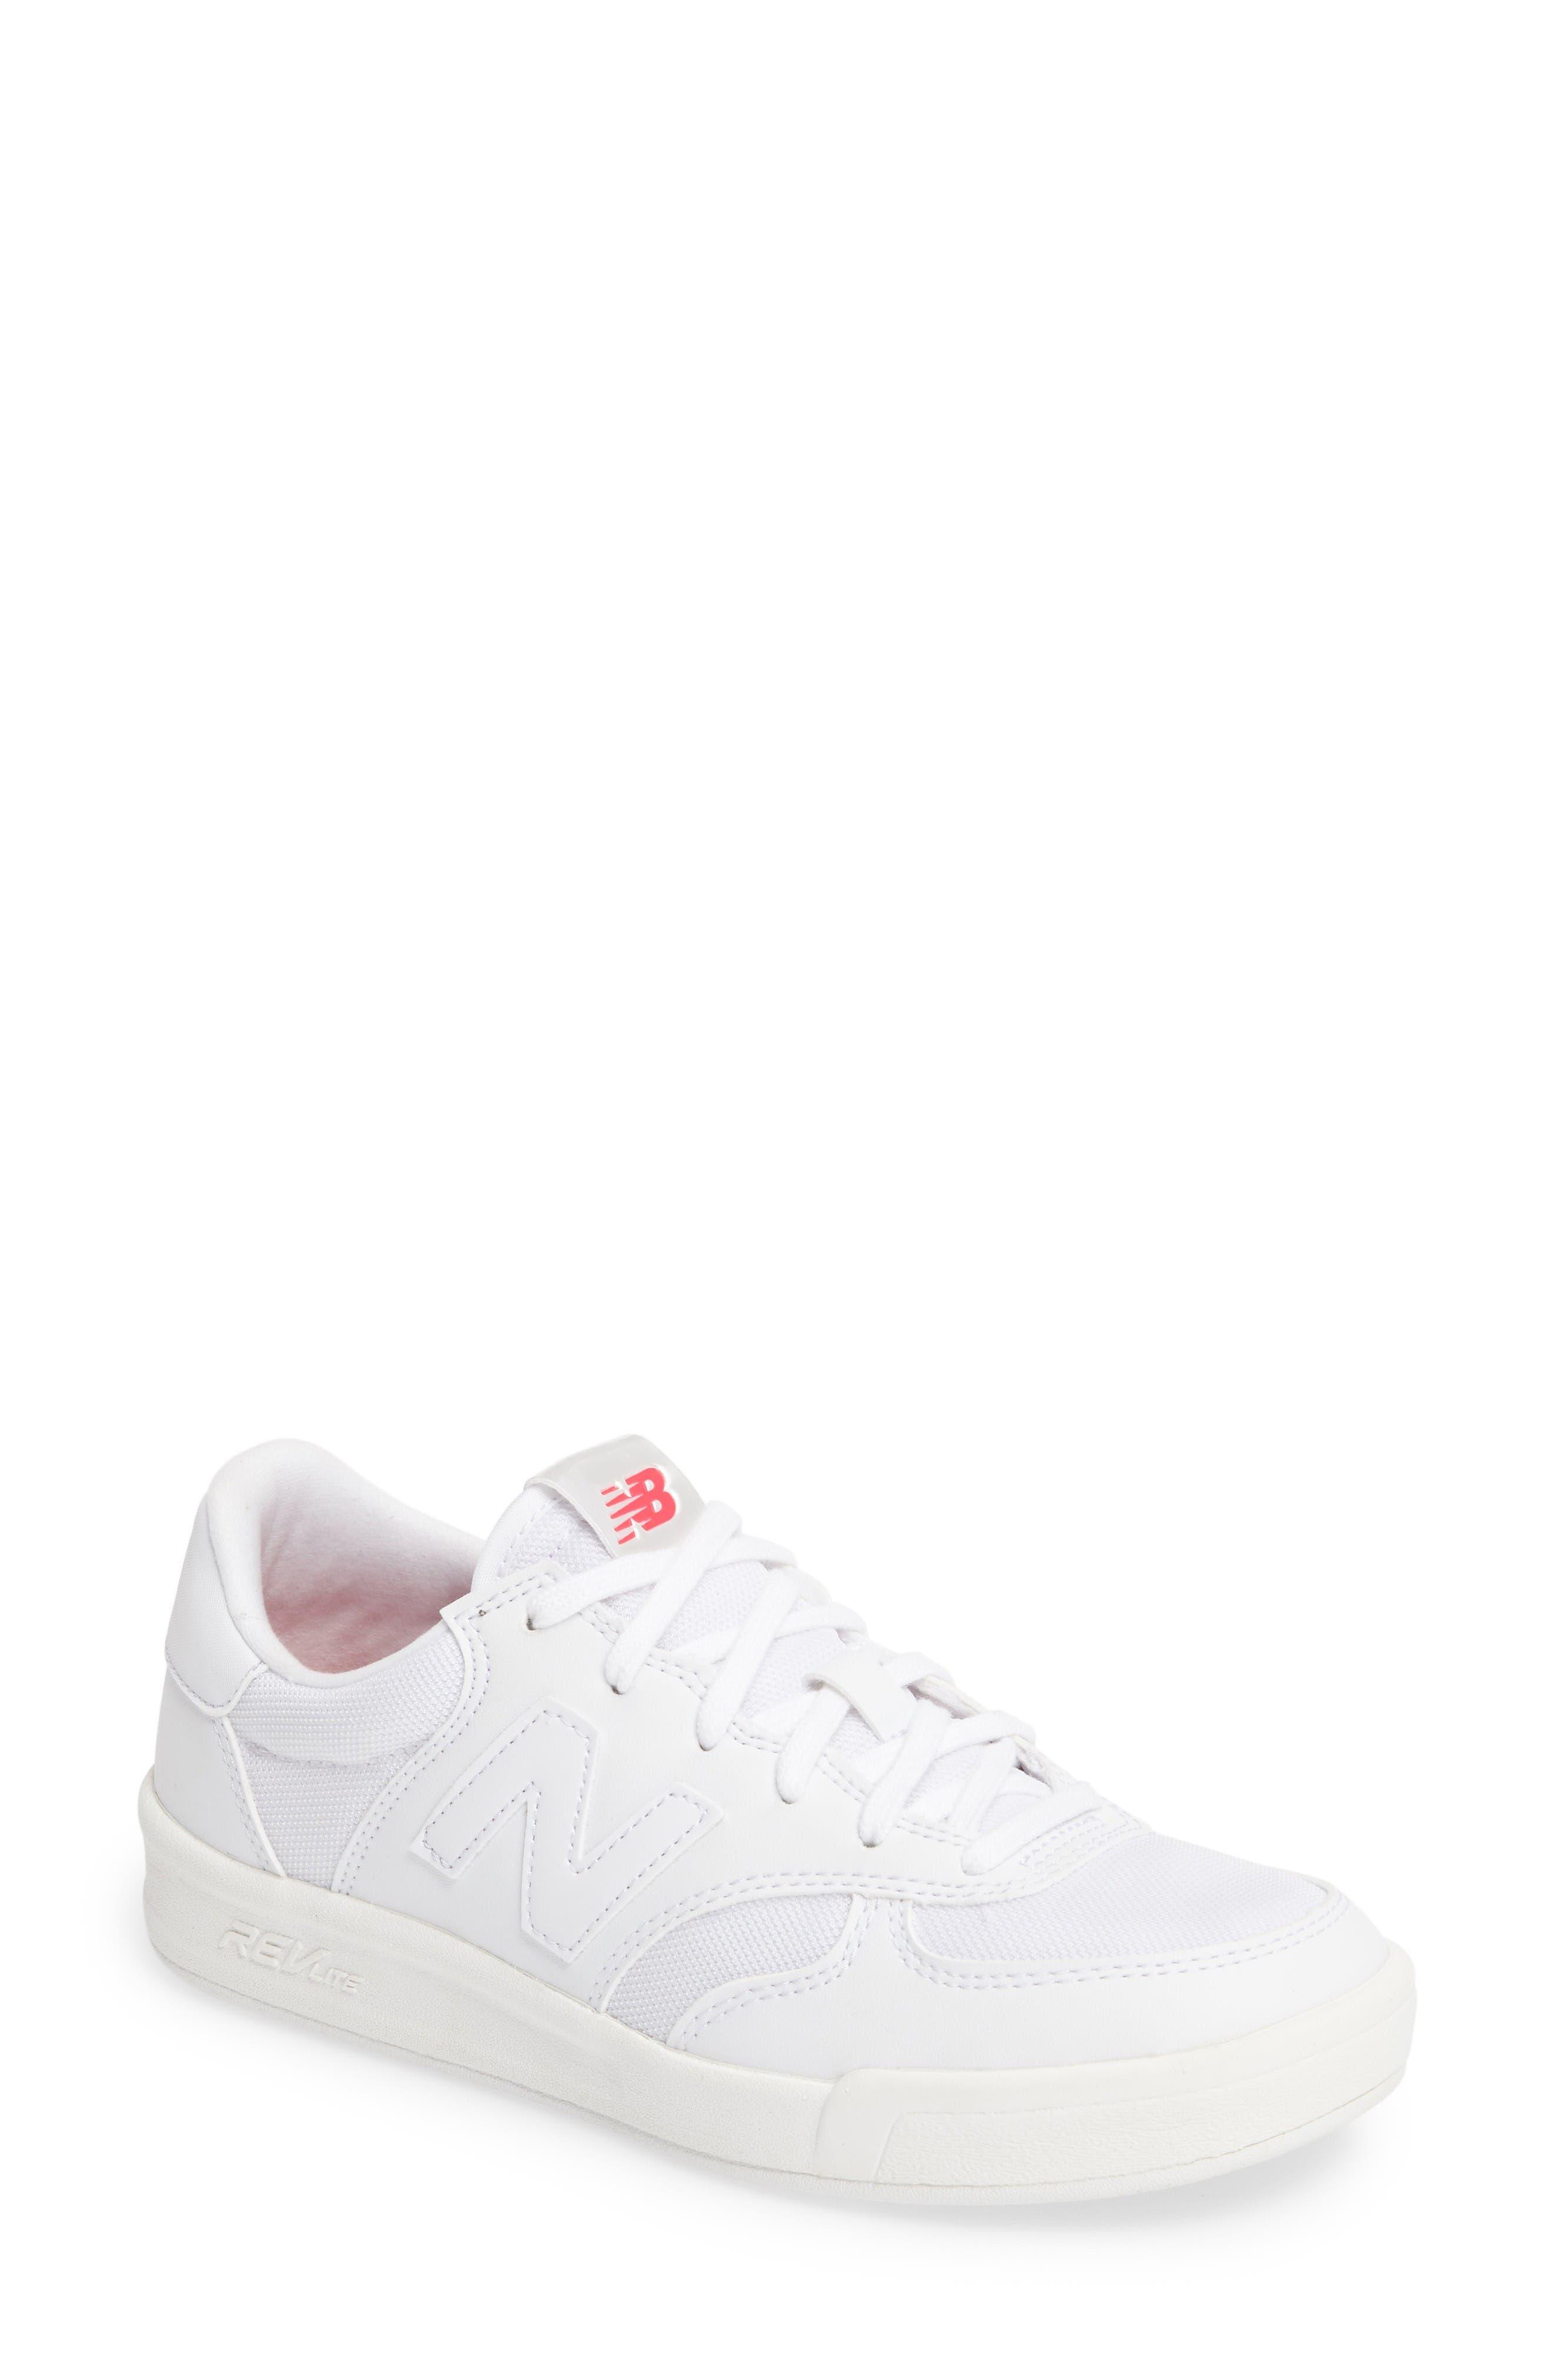 Alternate Image 1 Selected - New Balance Sport Style 300 Sneaker (Women)